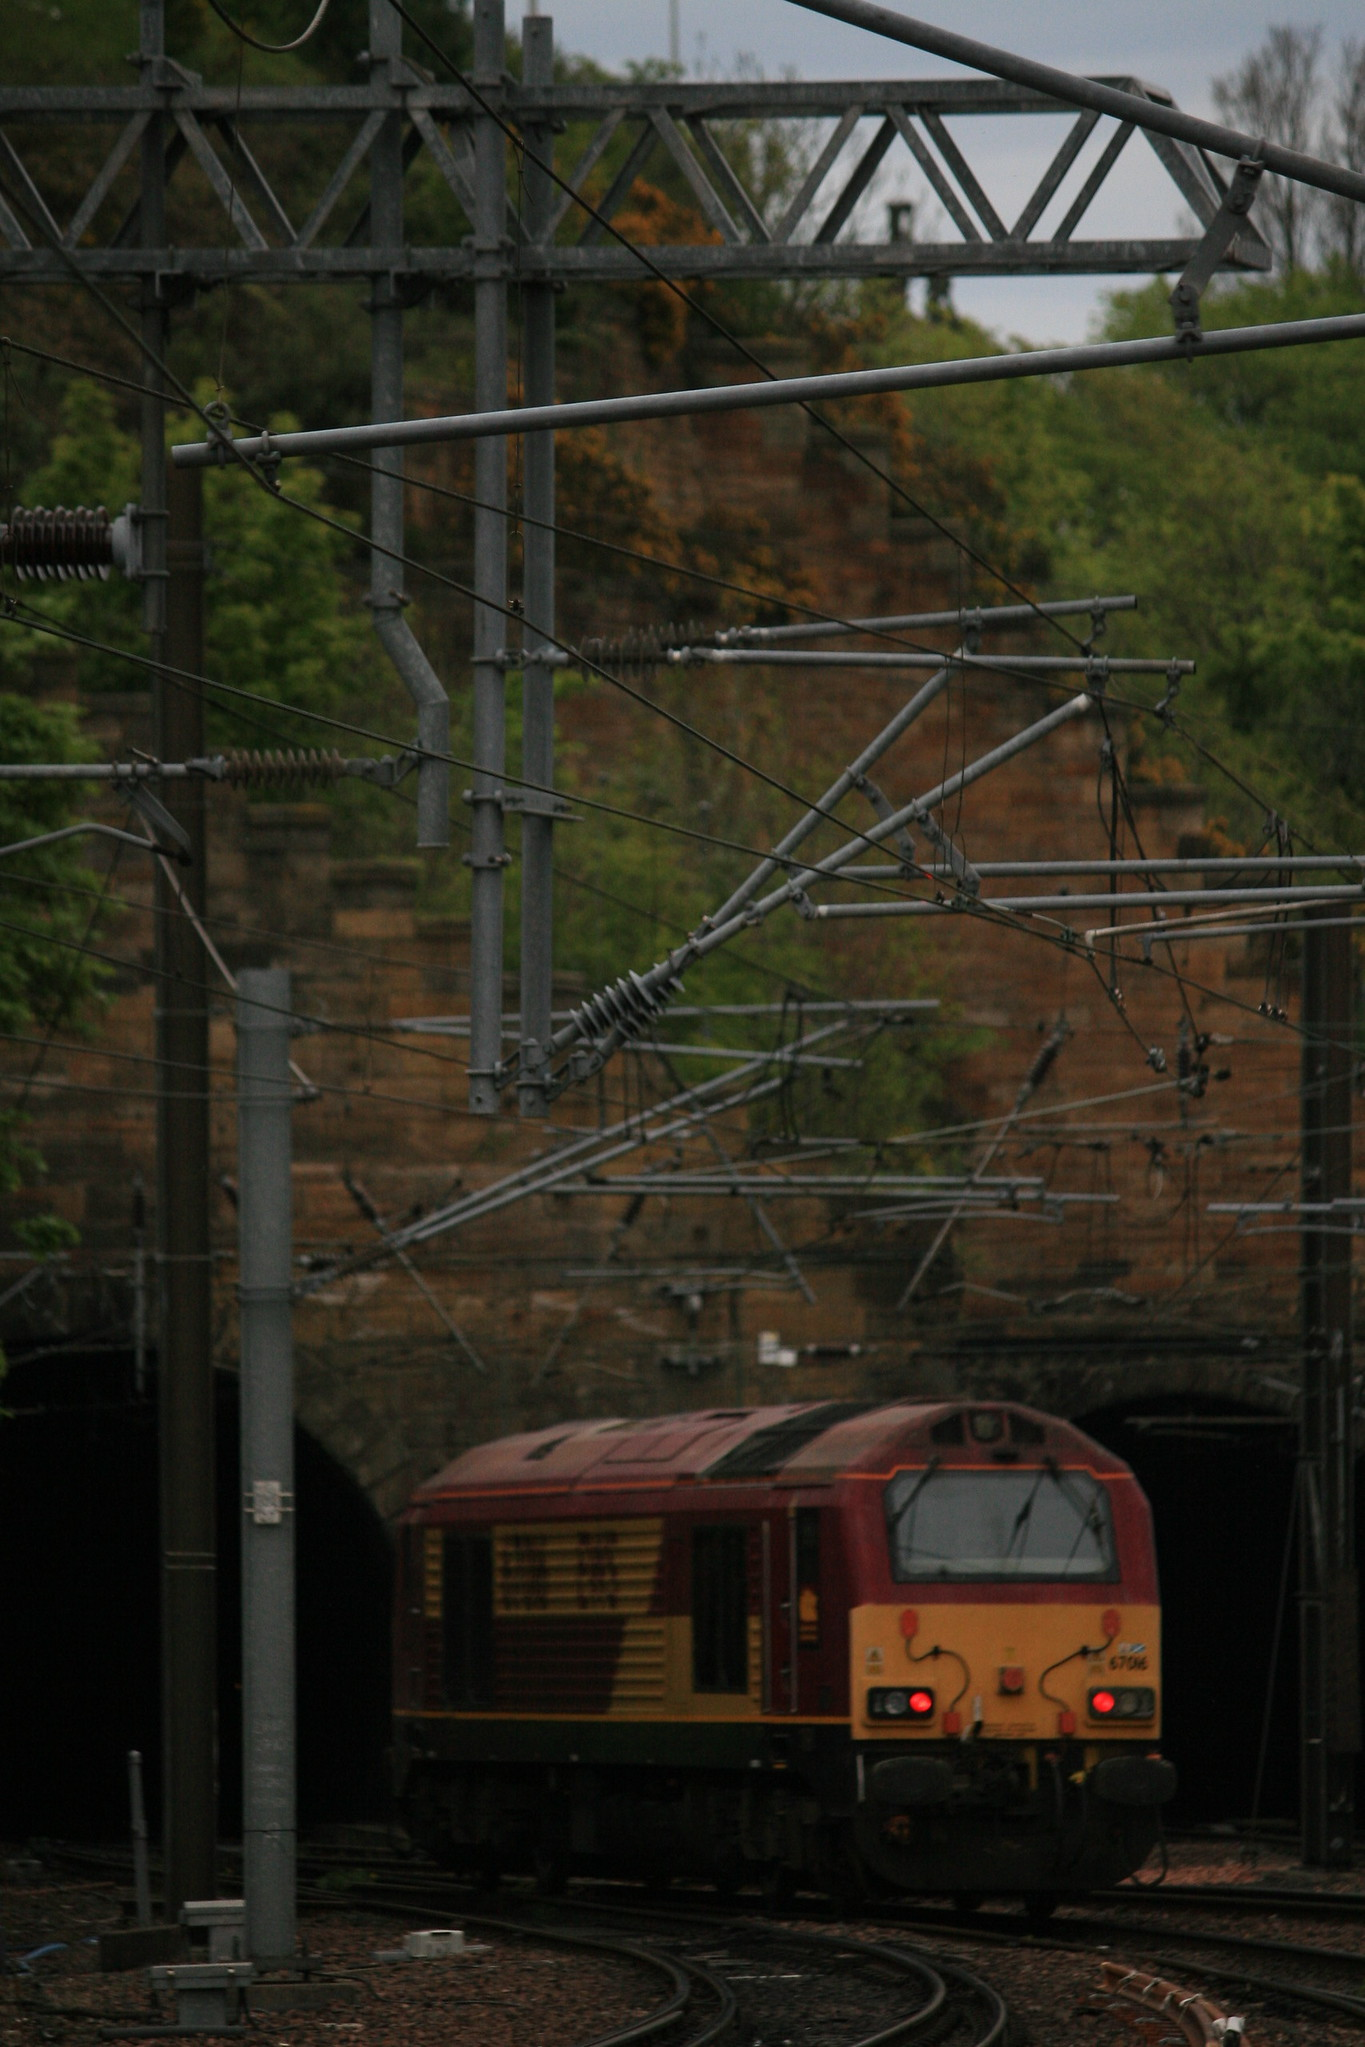 67016_DBS_EdinburghWaverley_17052016 (141)